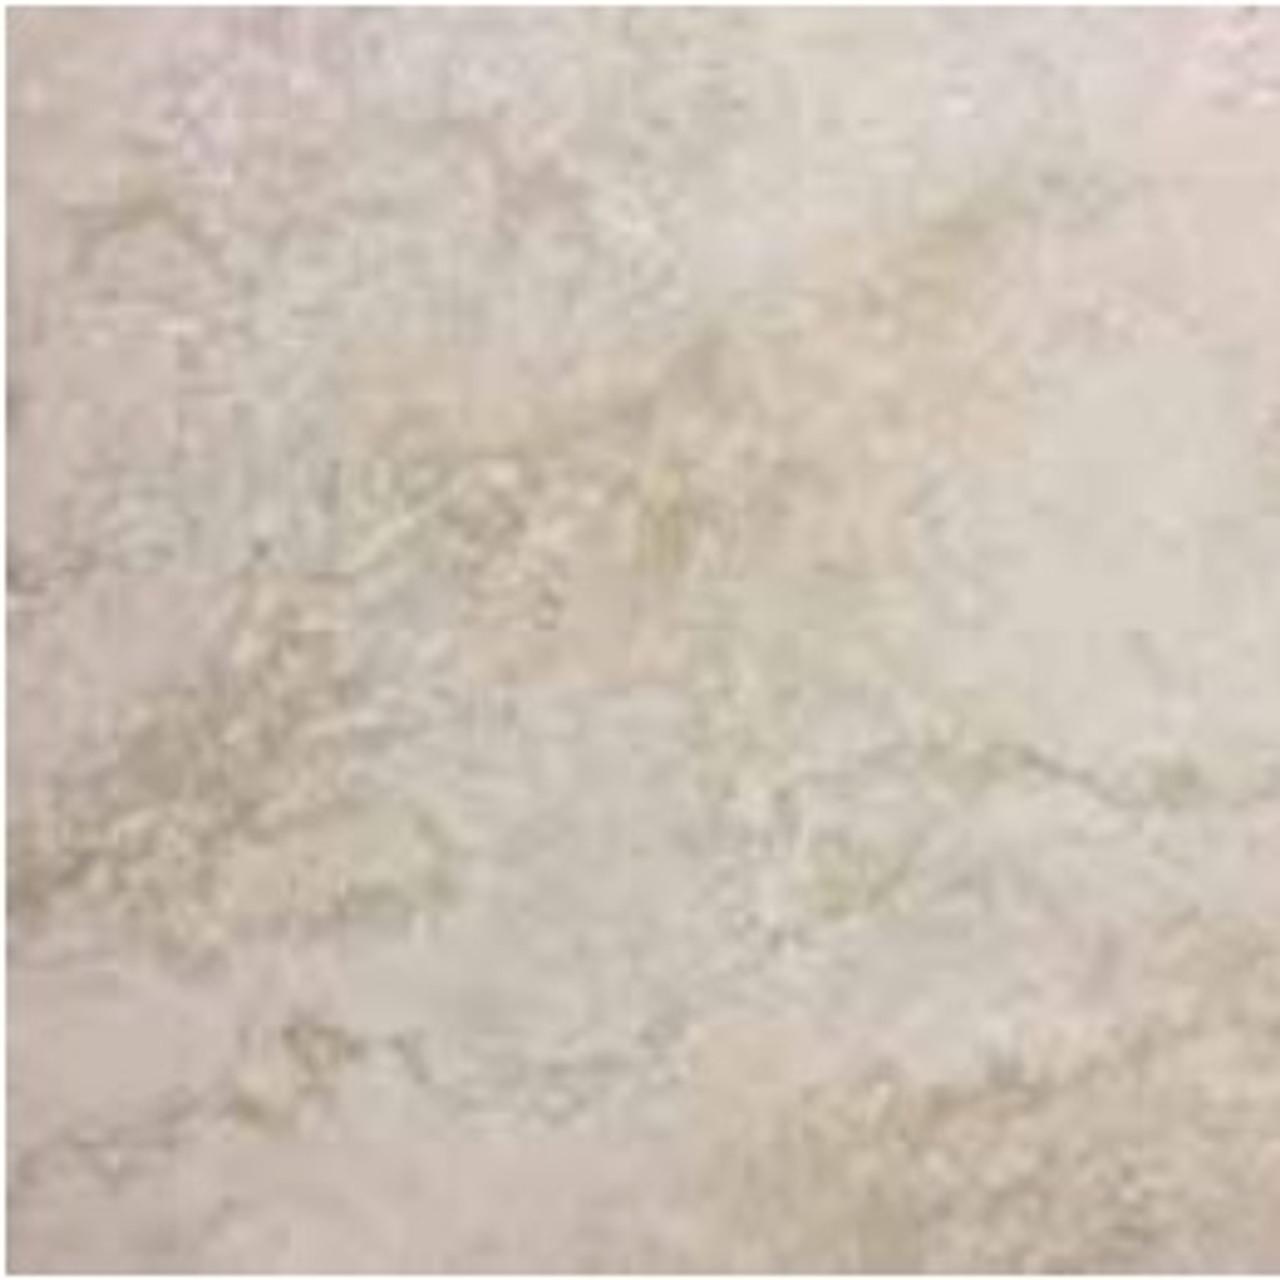 princeps plus beige 18x18 porcelain tile 1st quality 15 28 sf box